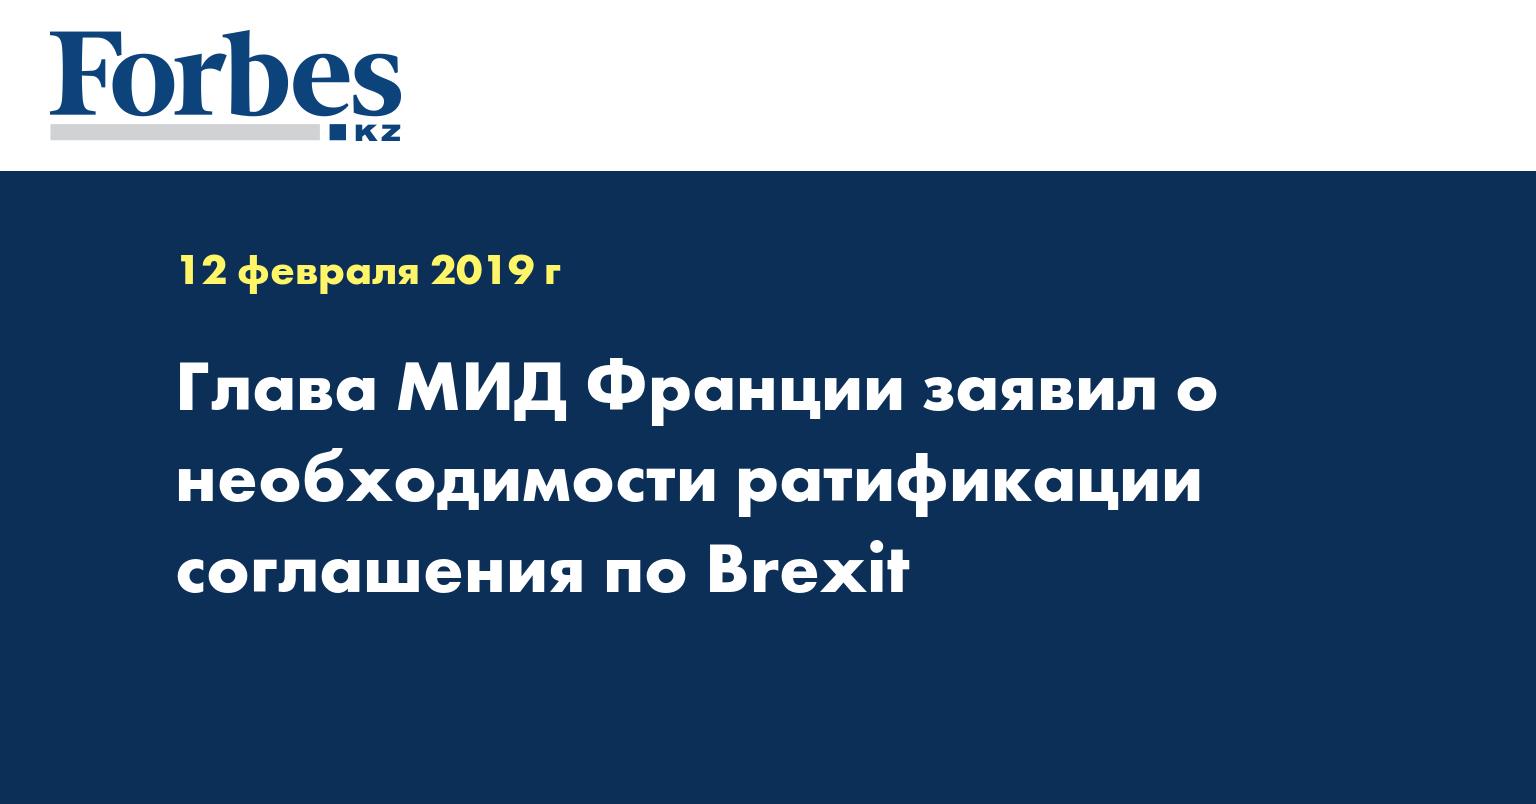 Глава МИД Франции заявил о необходимости ратификации соглашения по Brexit